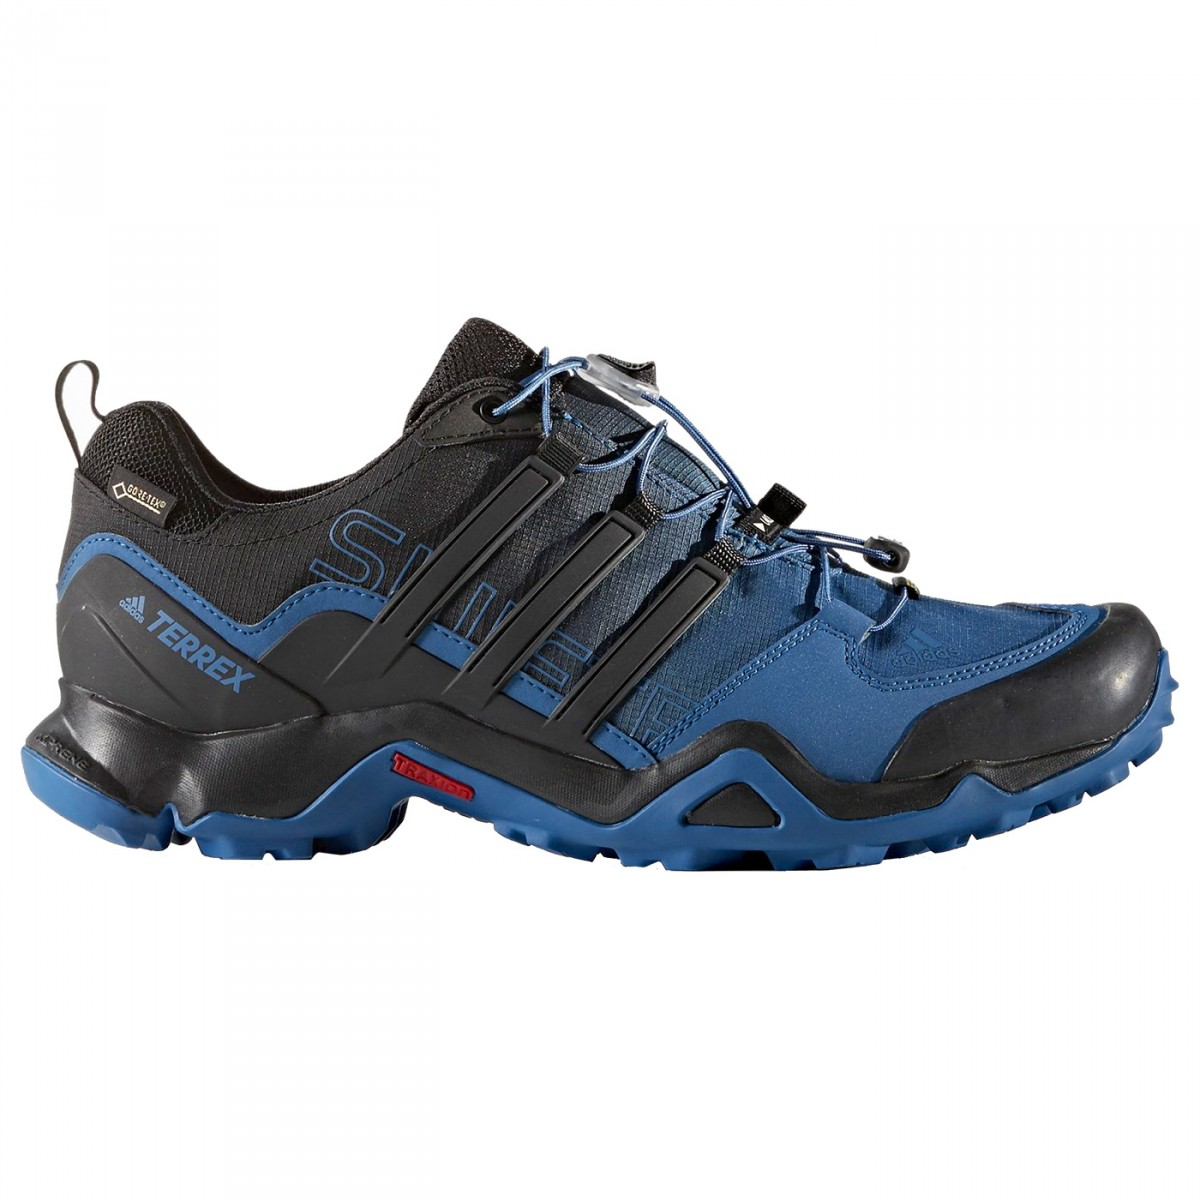 detailed look 2db24 aeb1d scarpe trekking adidas